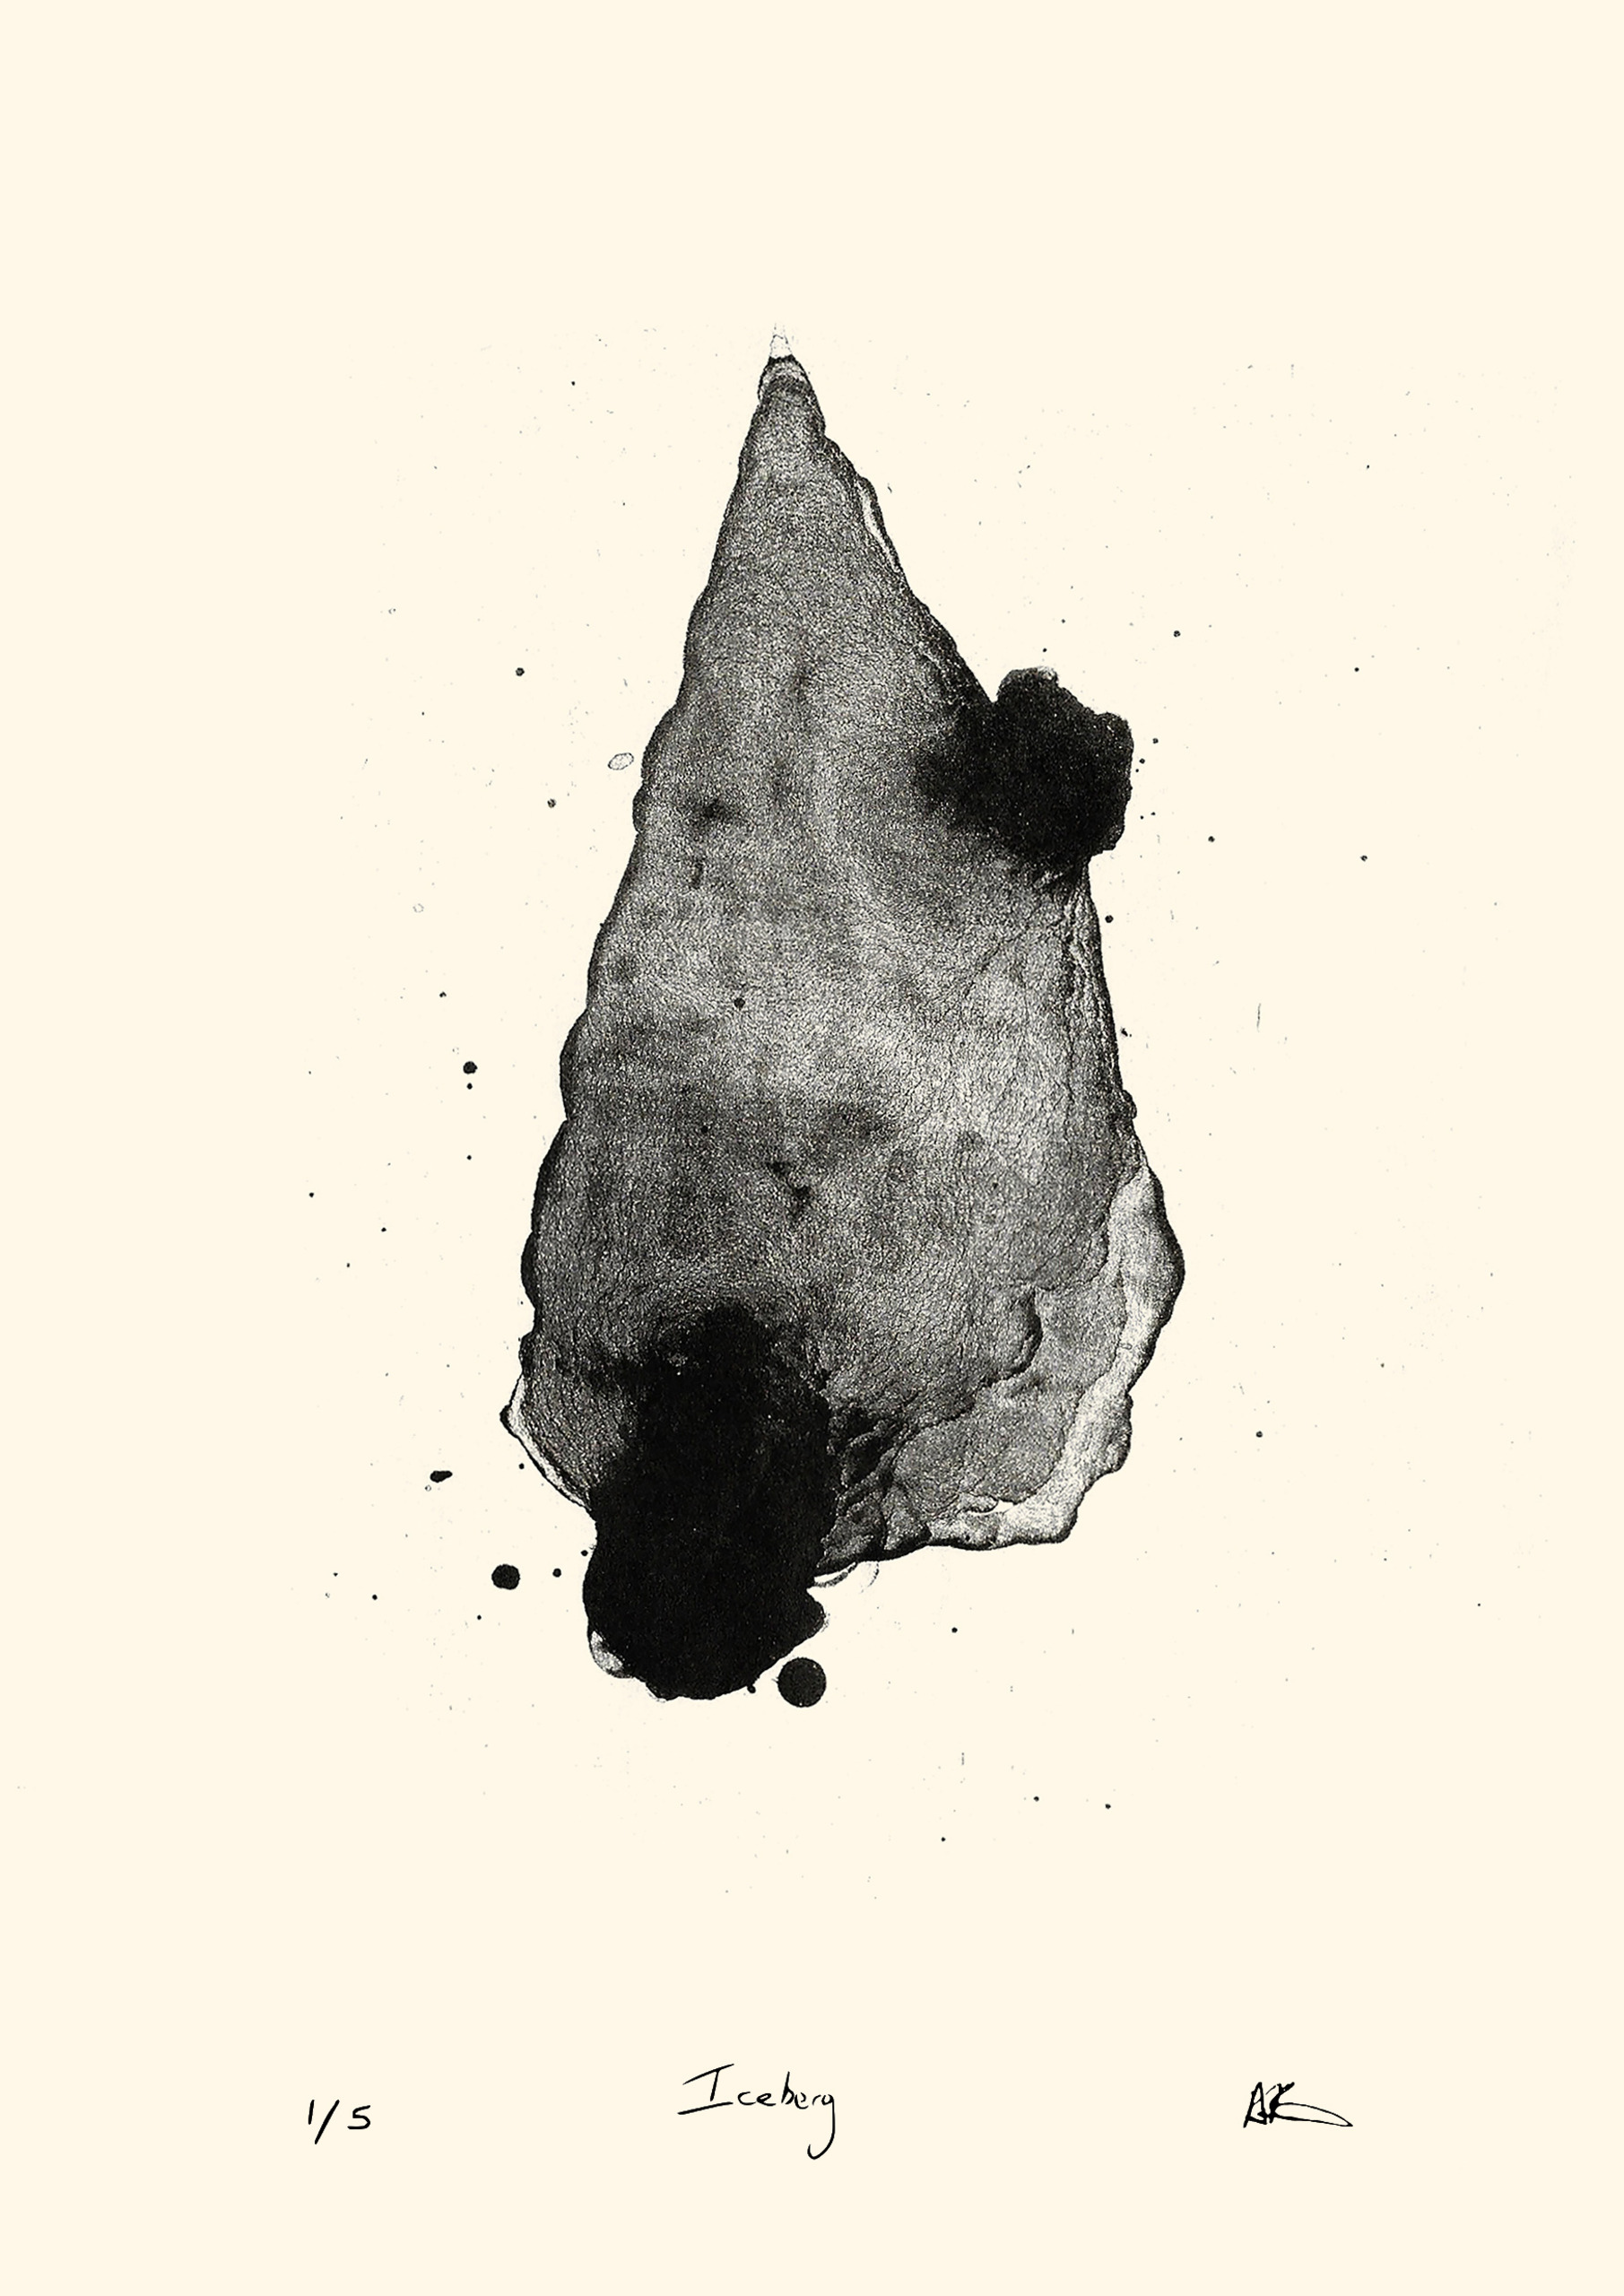 Spore - Iceberg